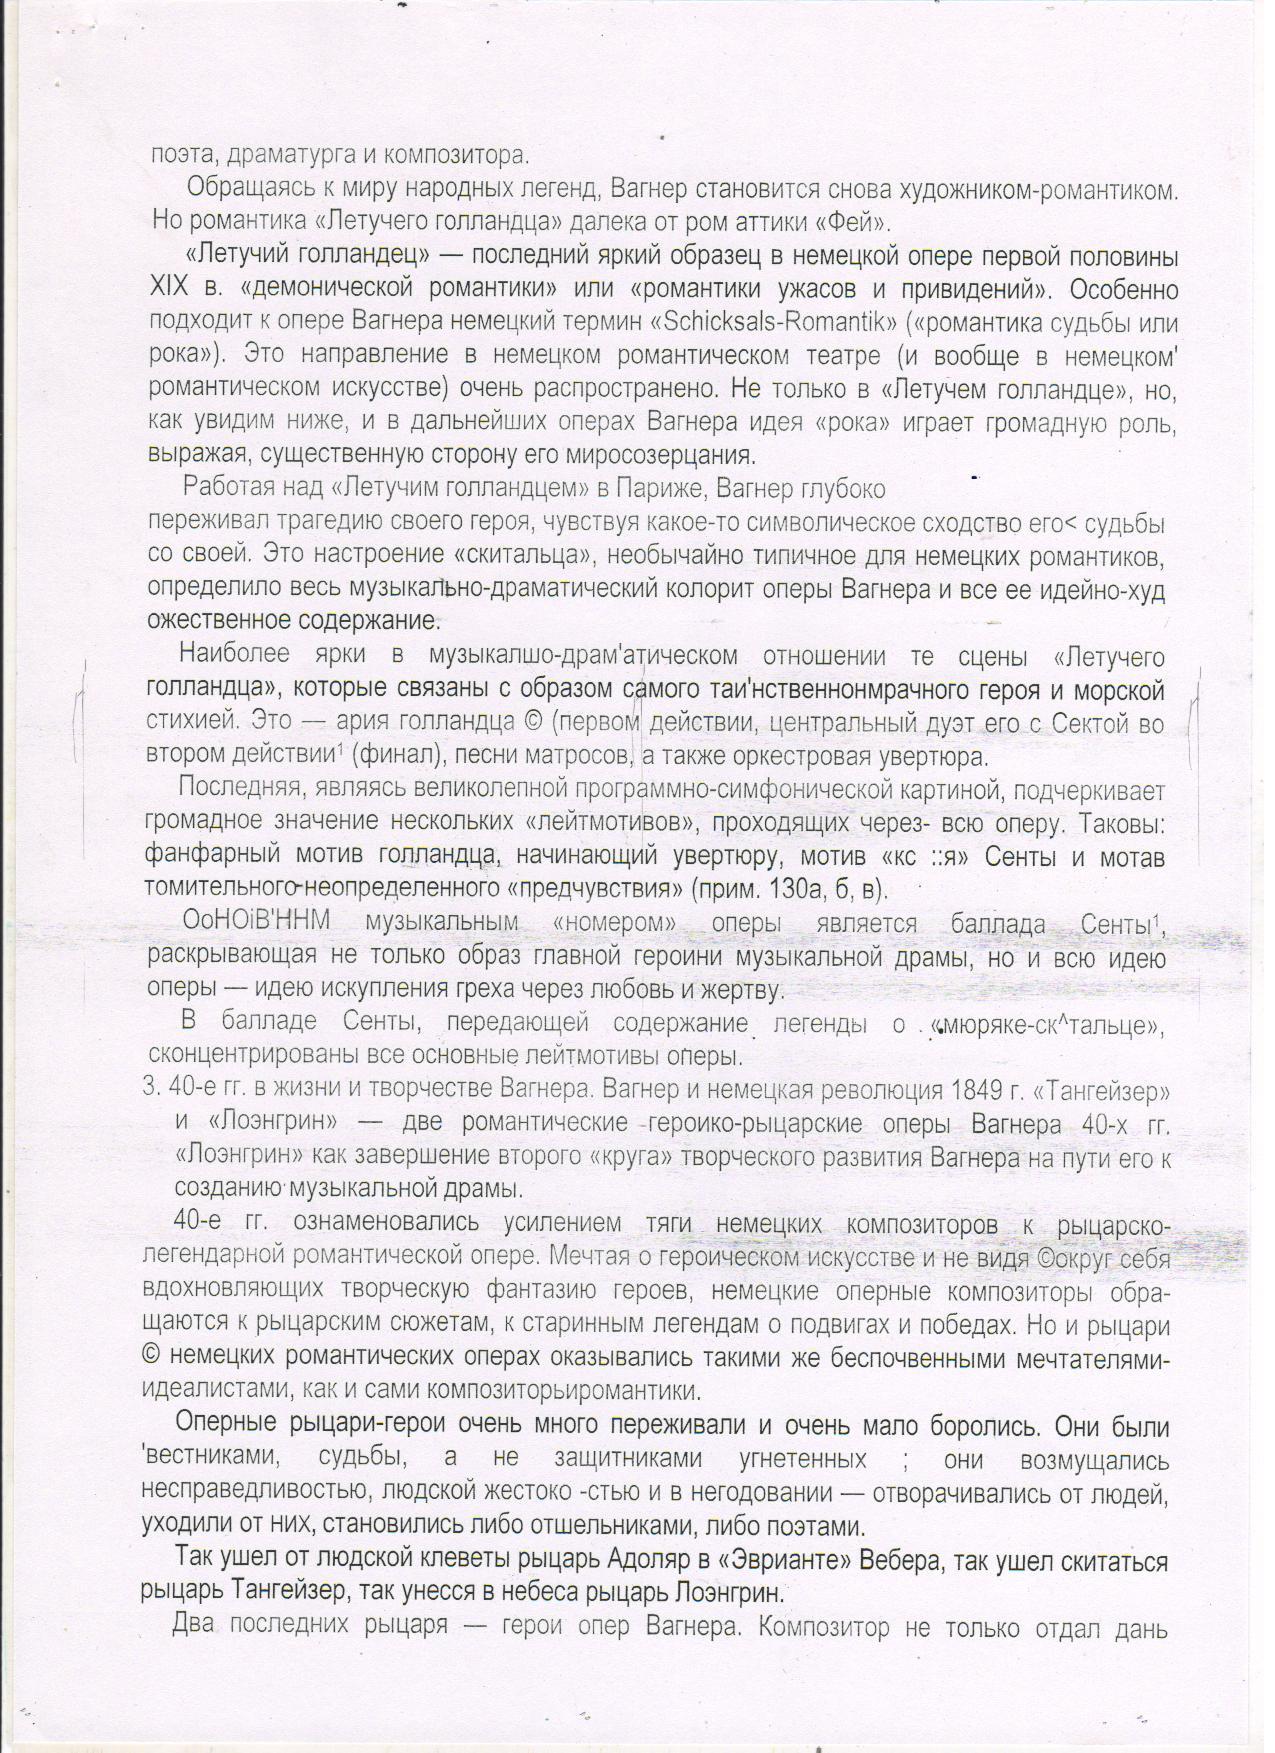 C:\Documents and Settings\Учитель\Рабочий стол\5 001.jpg